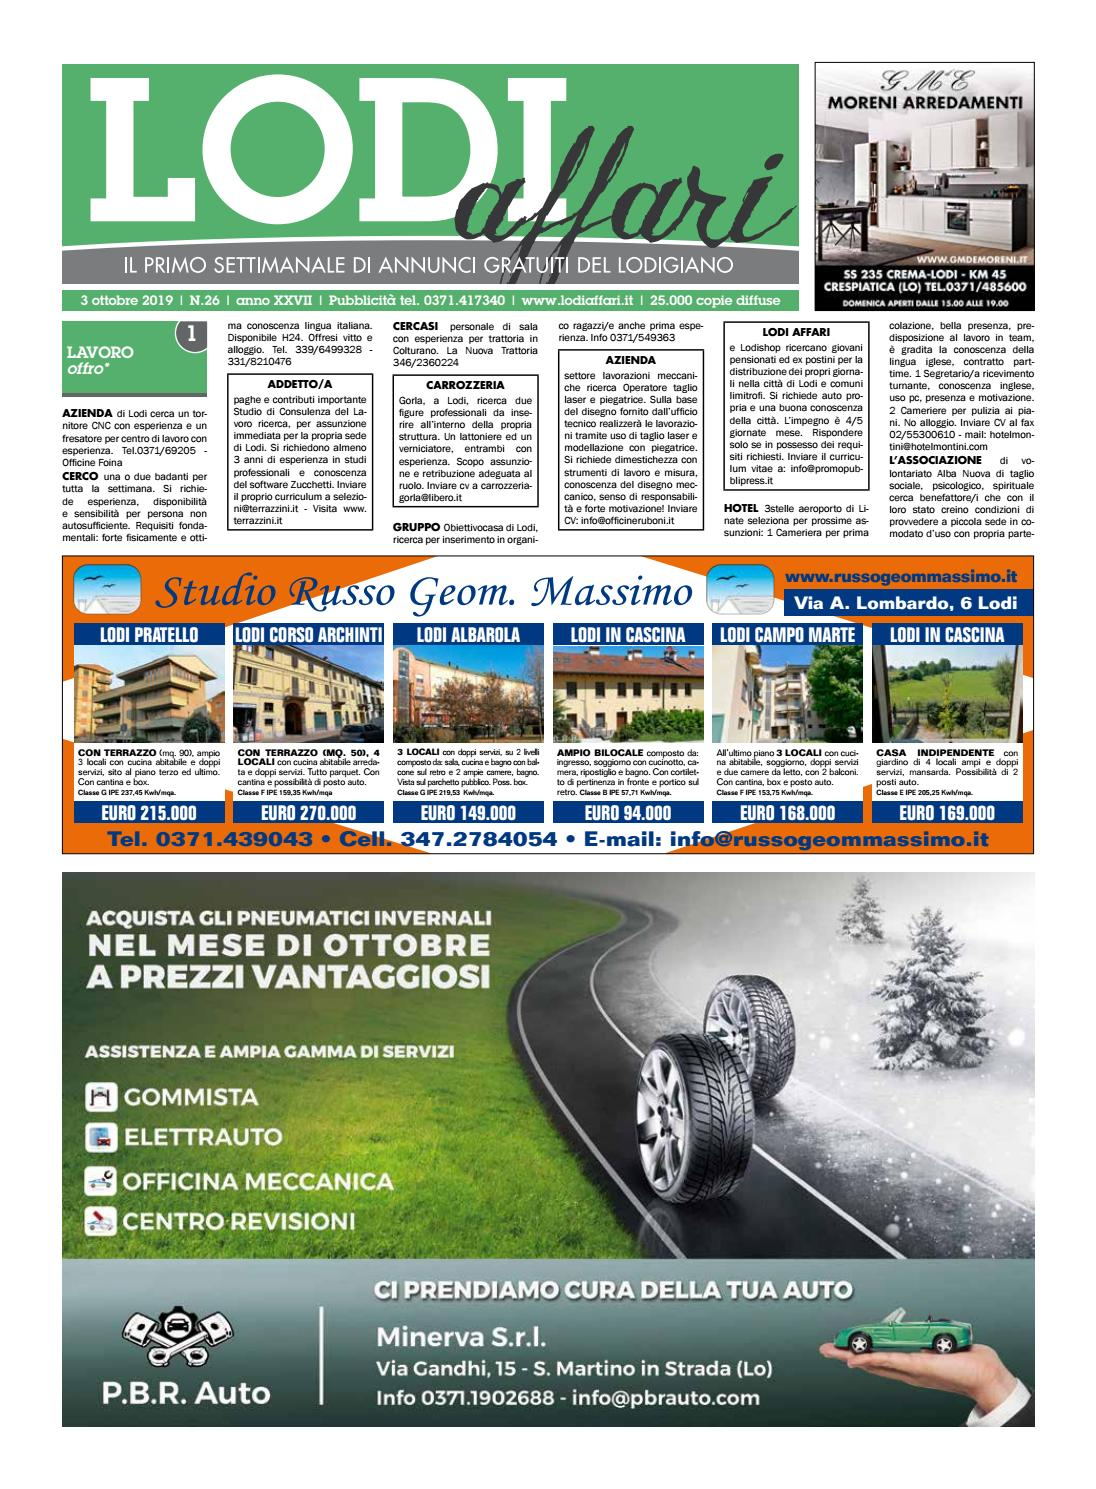 Camere Da Letto Lodi lodi affari 3 ottobre by lodi affari - issuu